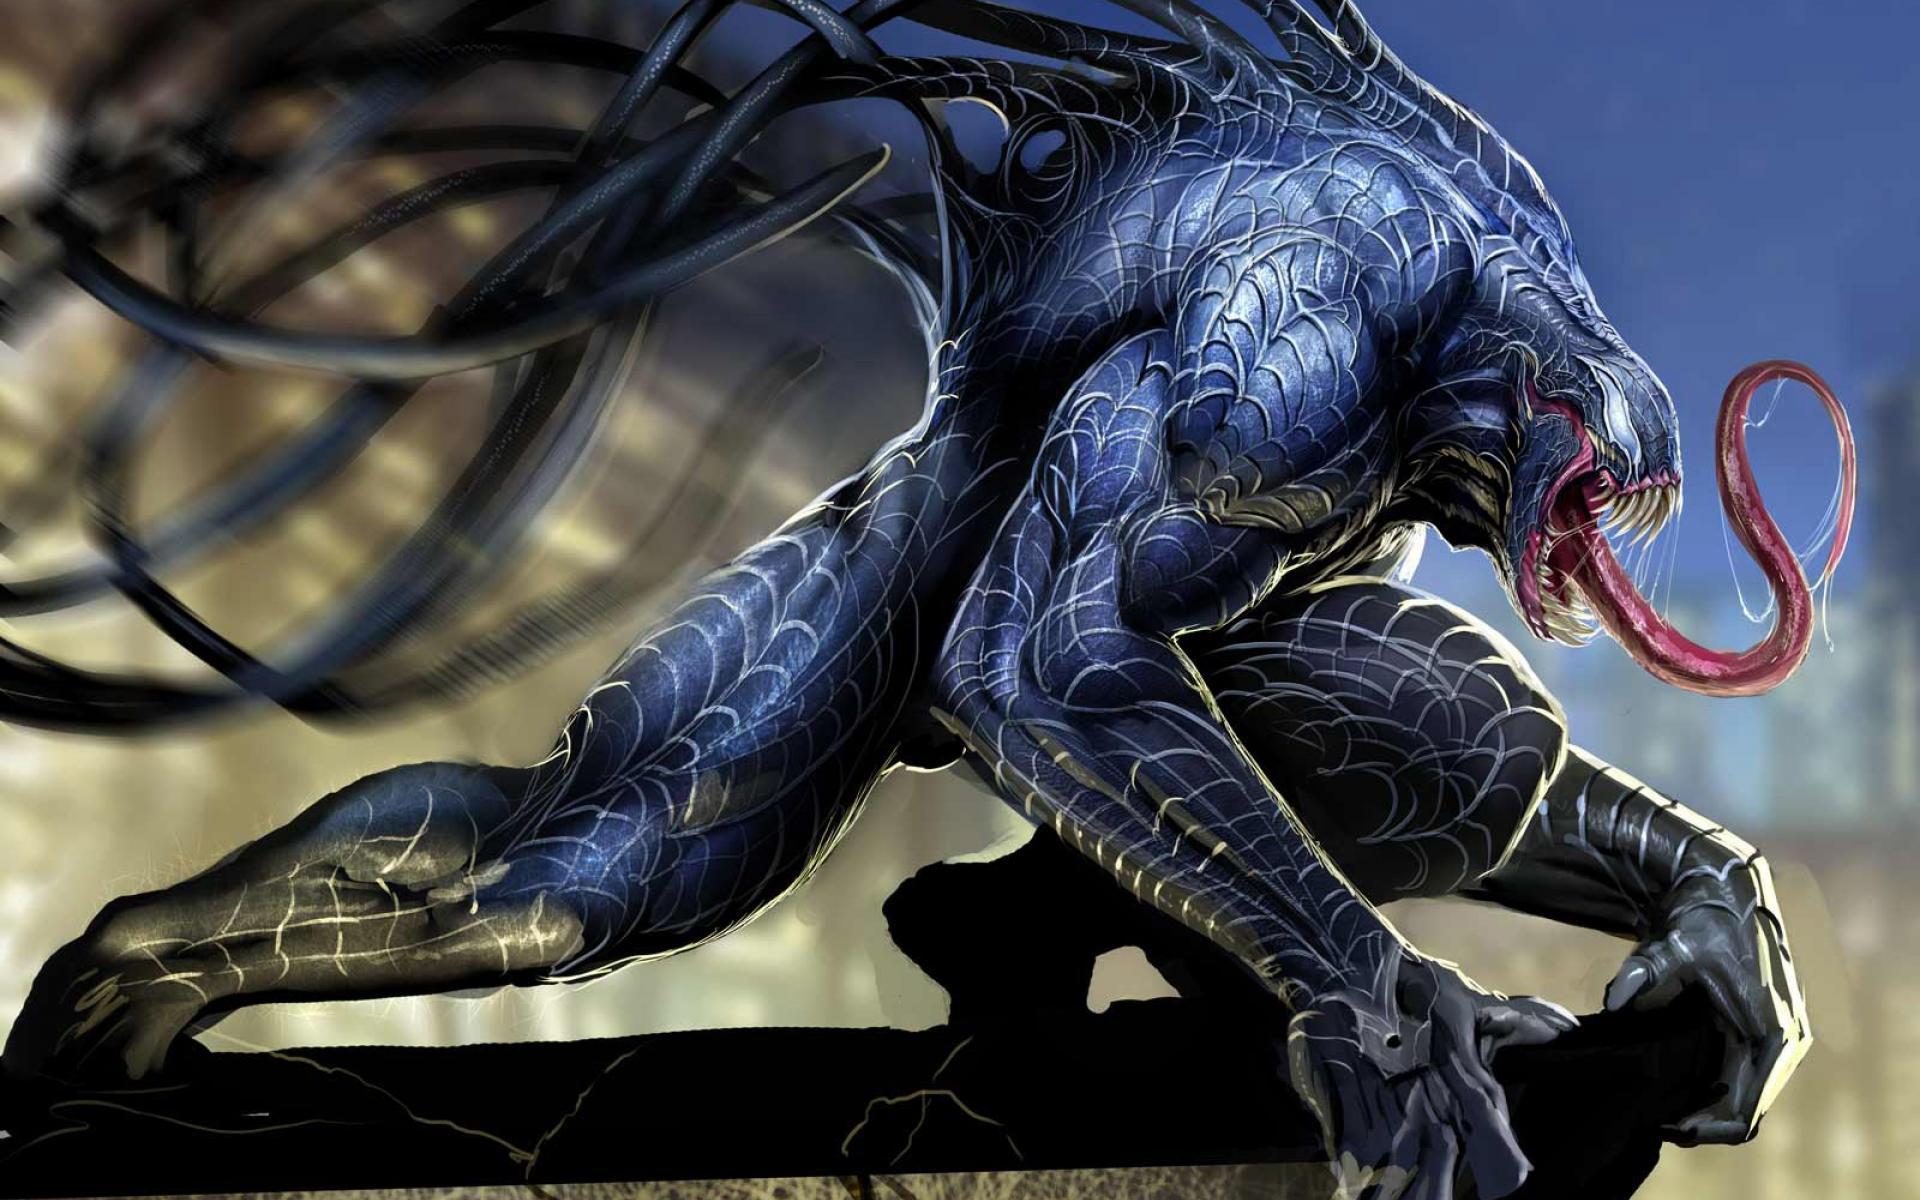 Venom 4k Wallpapers For Your Desktop Or Mobile Screen Free